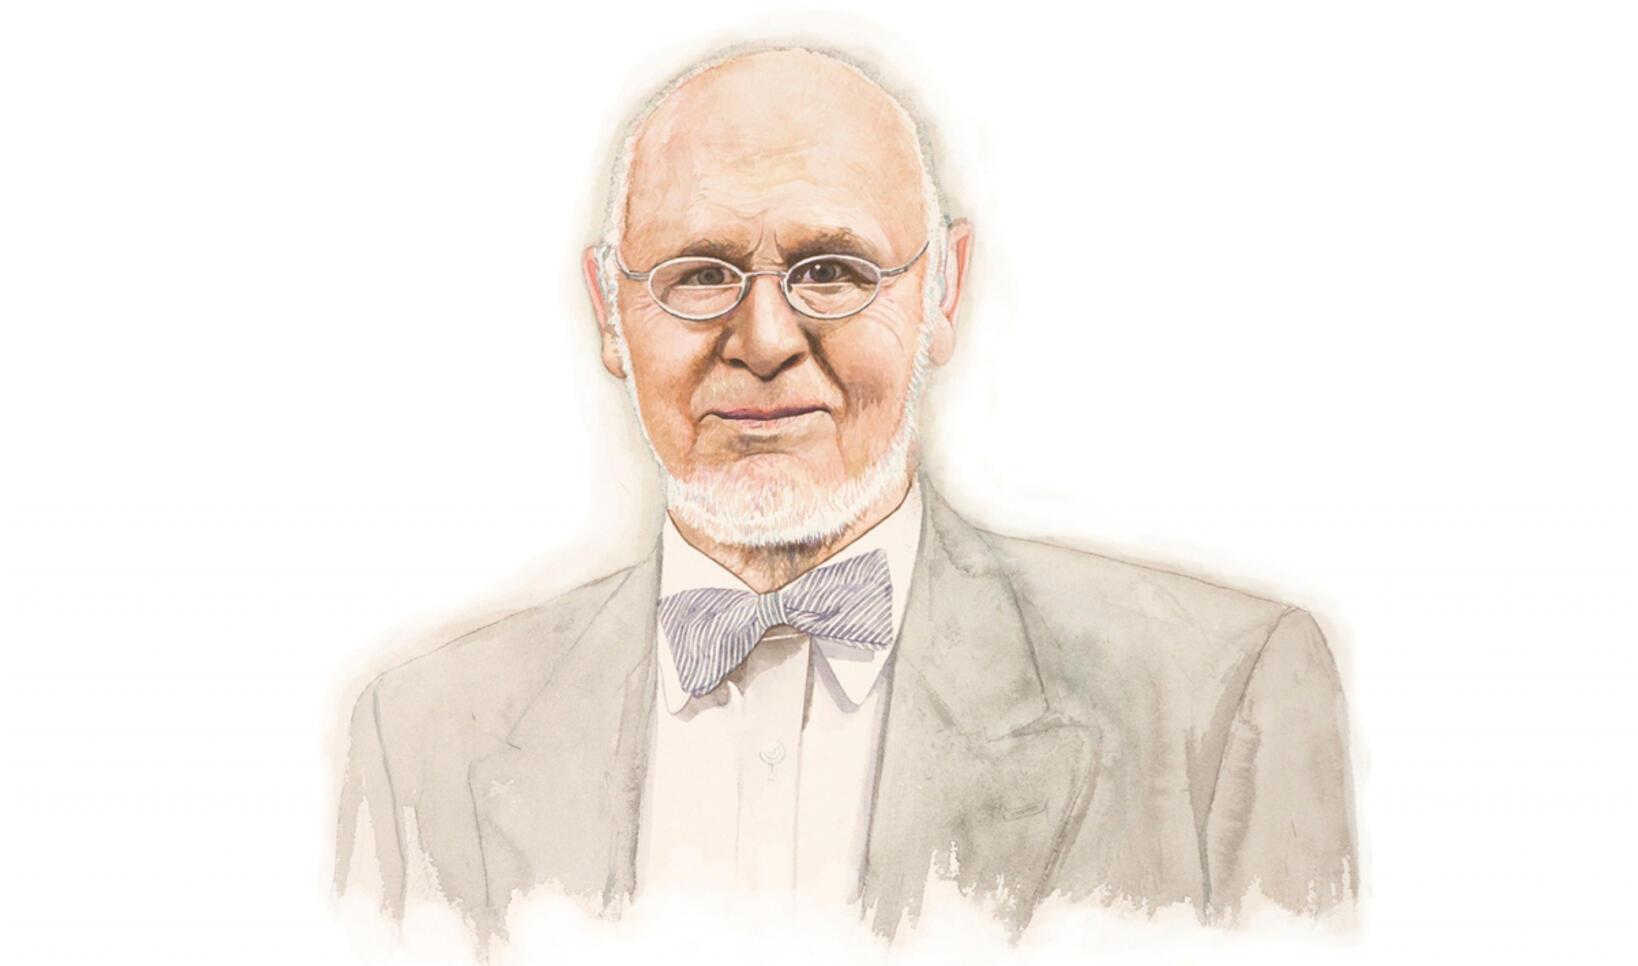 Illustrated portrait of Peter Seitz ; Michael Gaughan '02